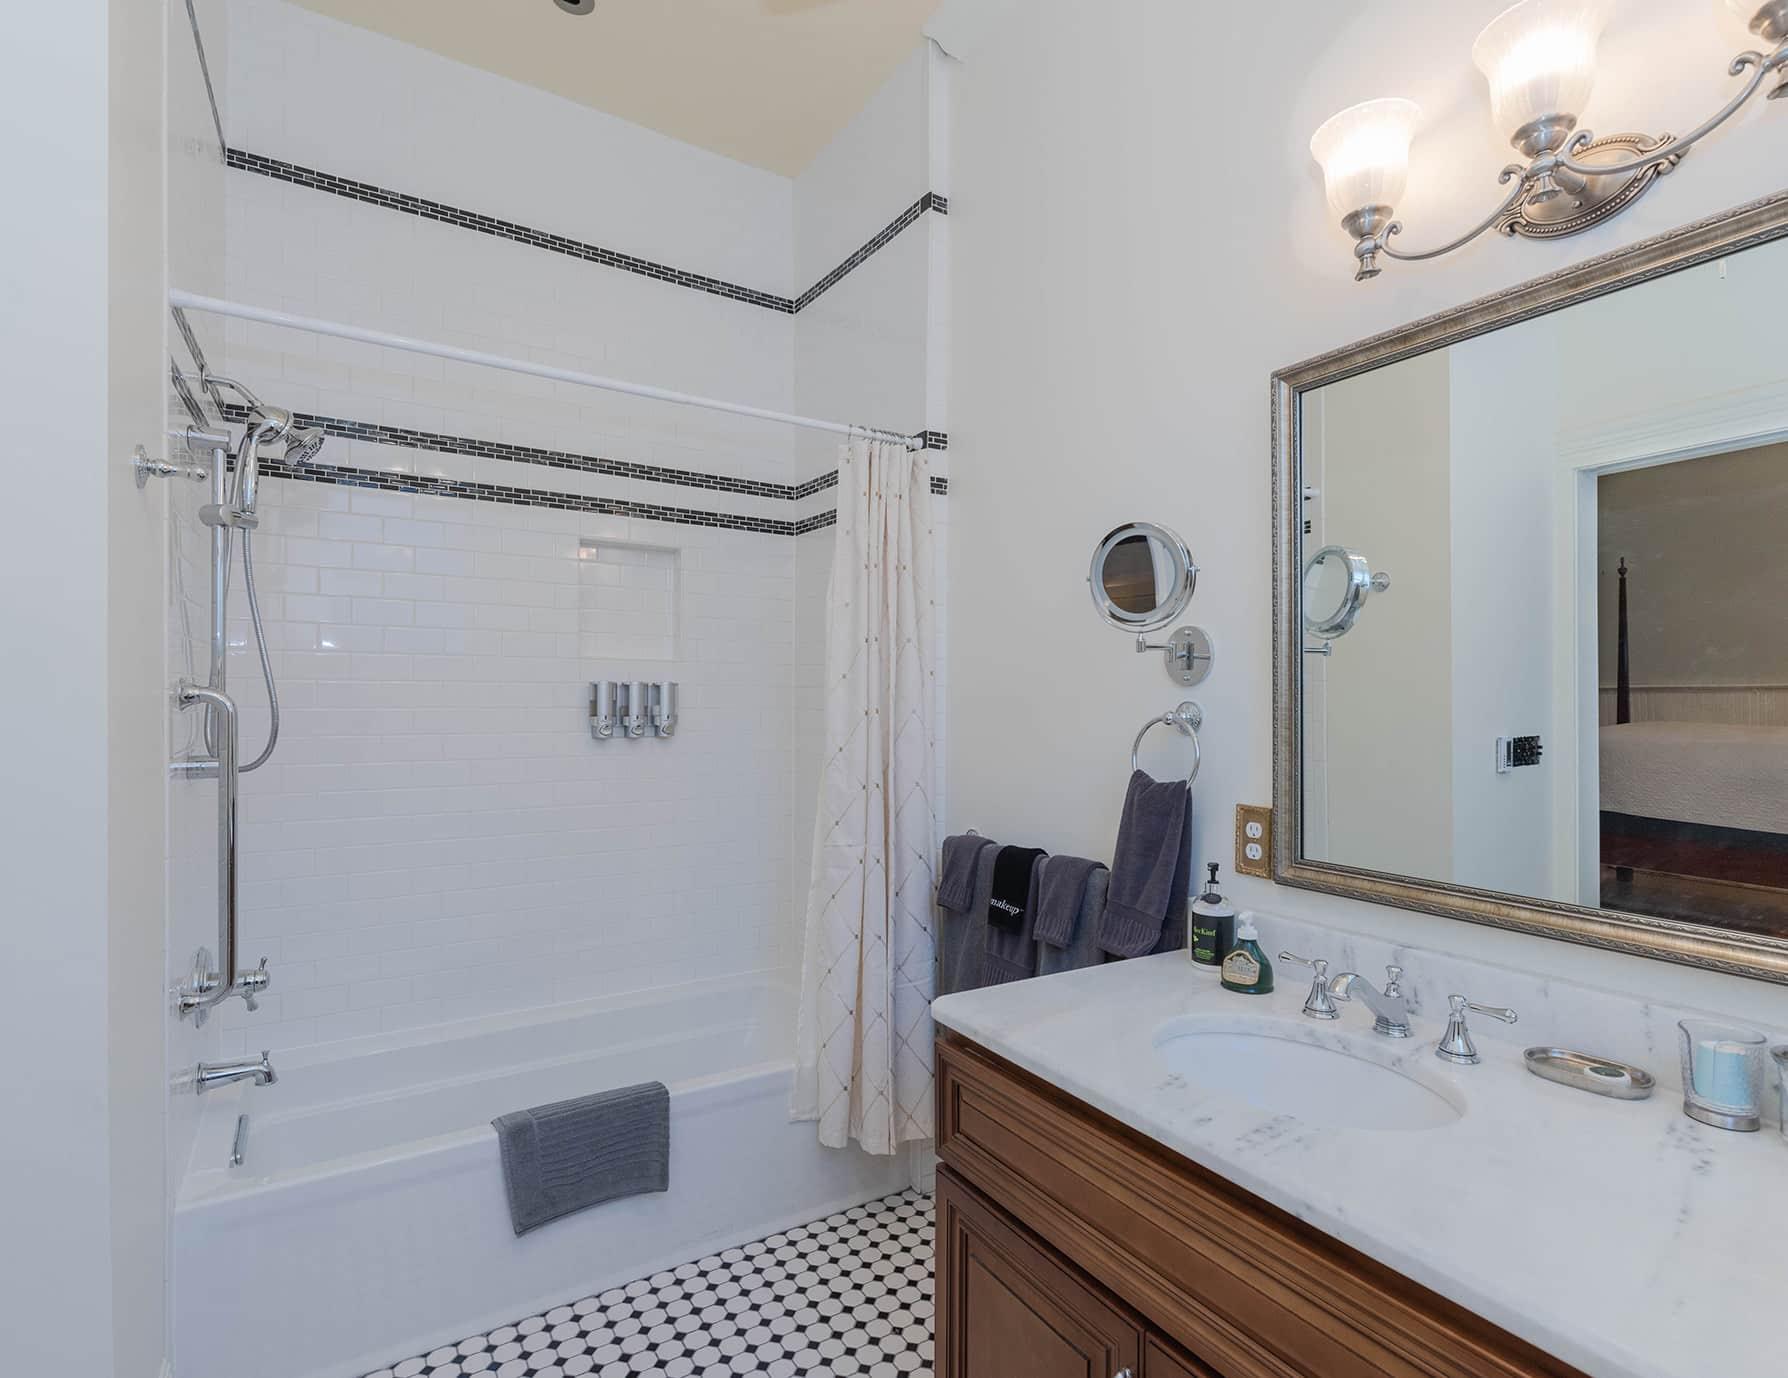 Michael Room - Romantic Accommodations in Natchez